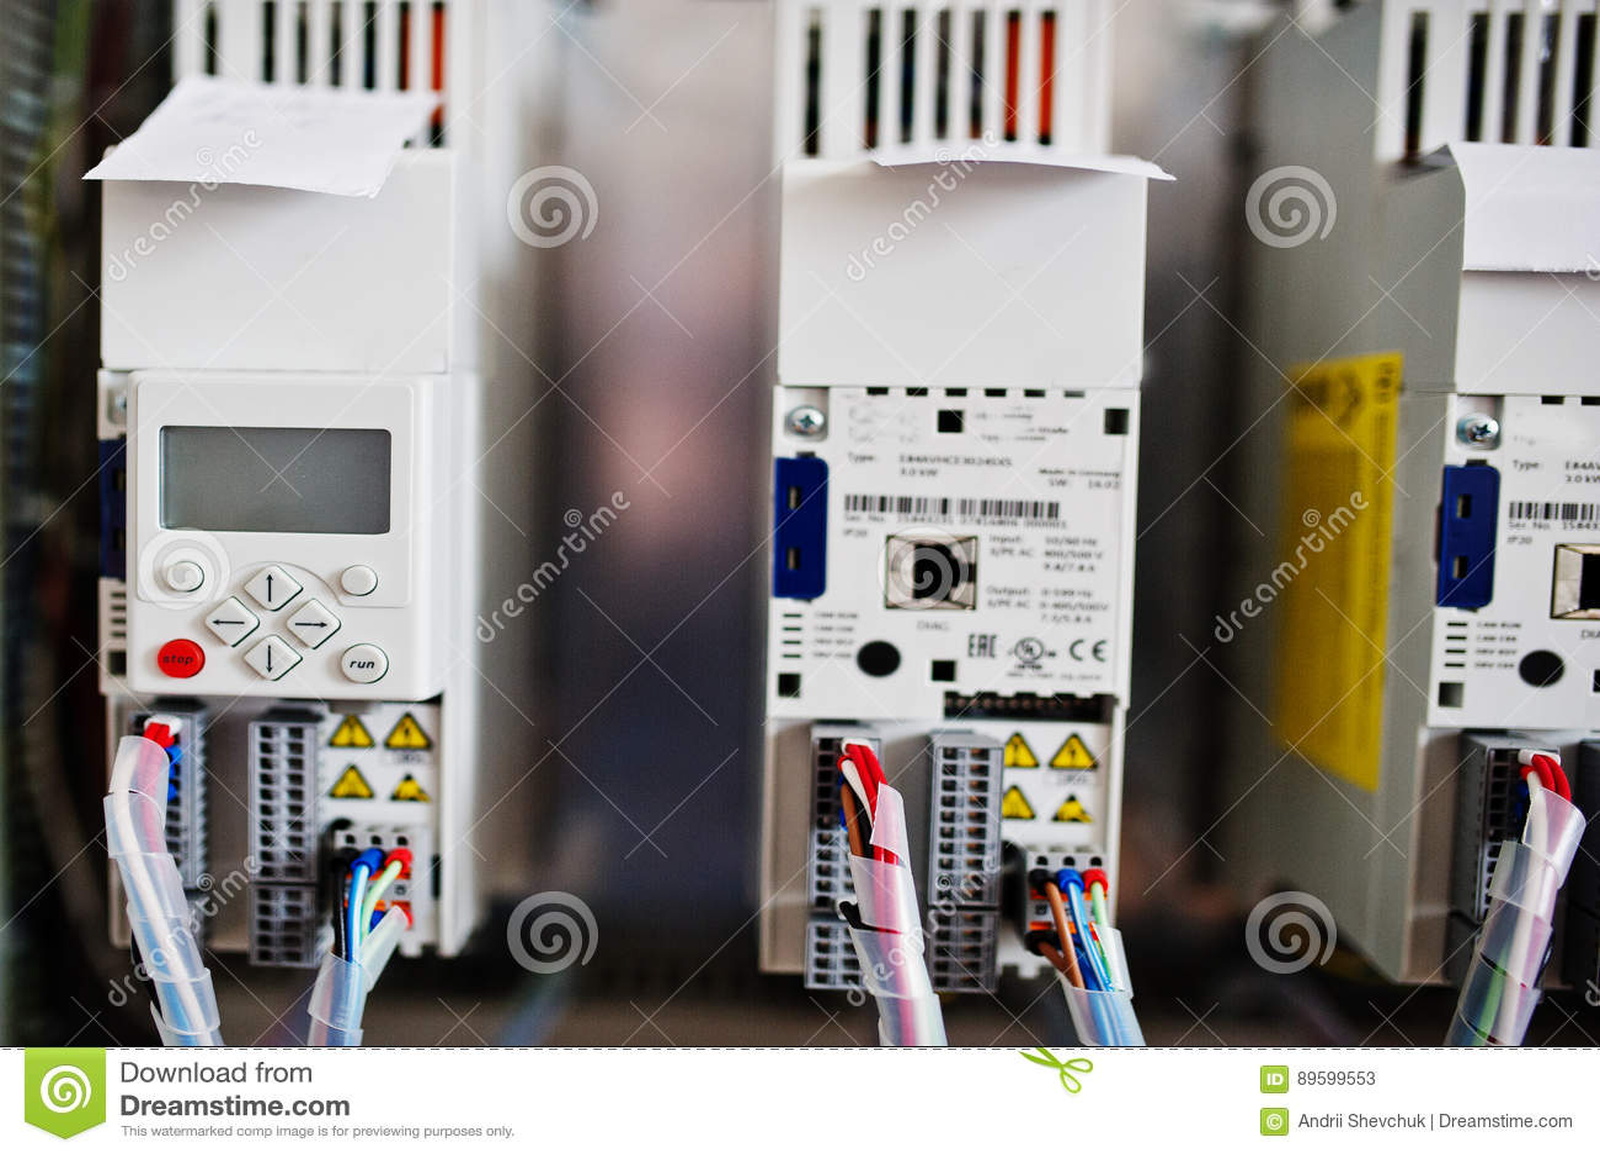 Schön 89 Elektrische Verdrahtungsstandards Bildinspirationen Ideen ...